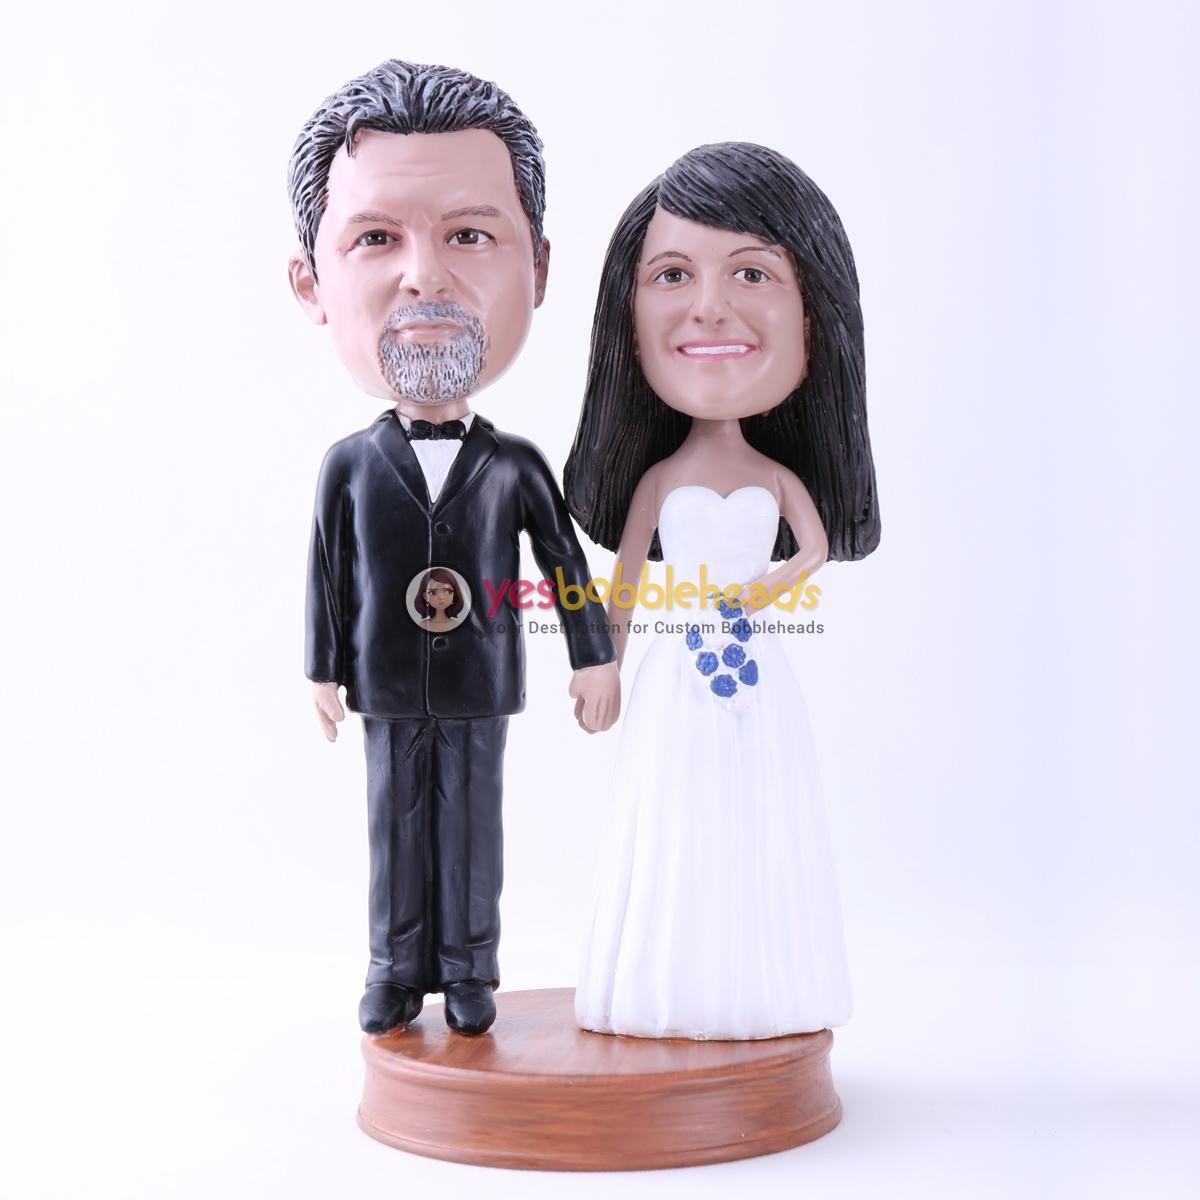 Picture of Custom Bobblehead Doll: Black Suit Groom & White Dressed Bride on Wedding